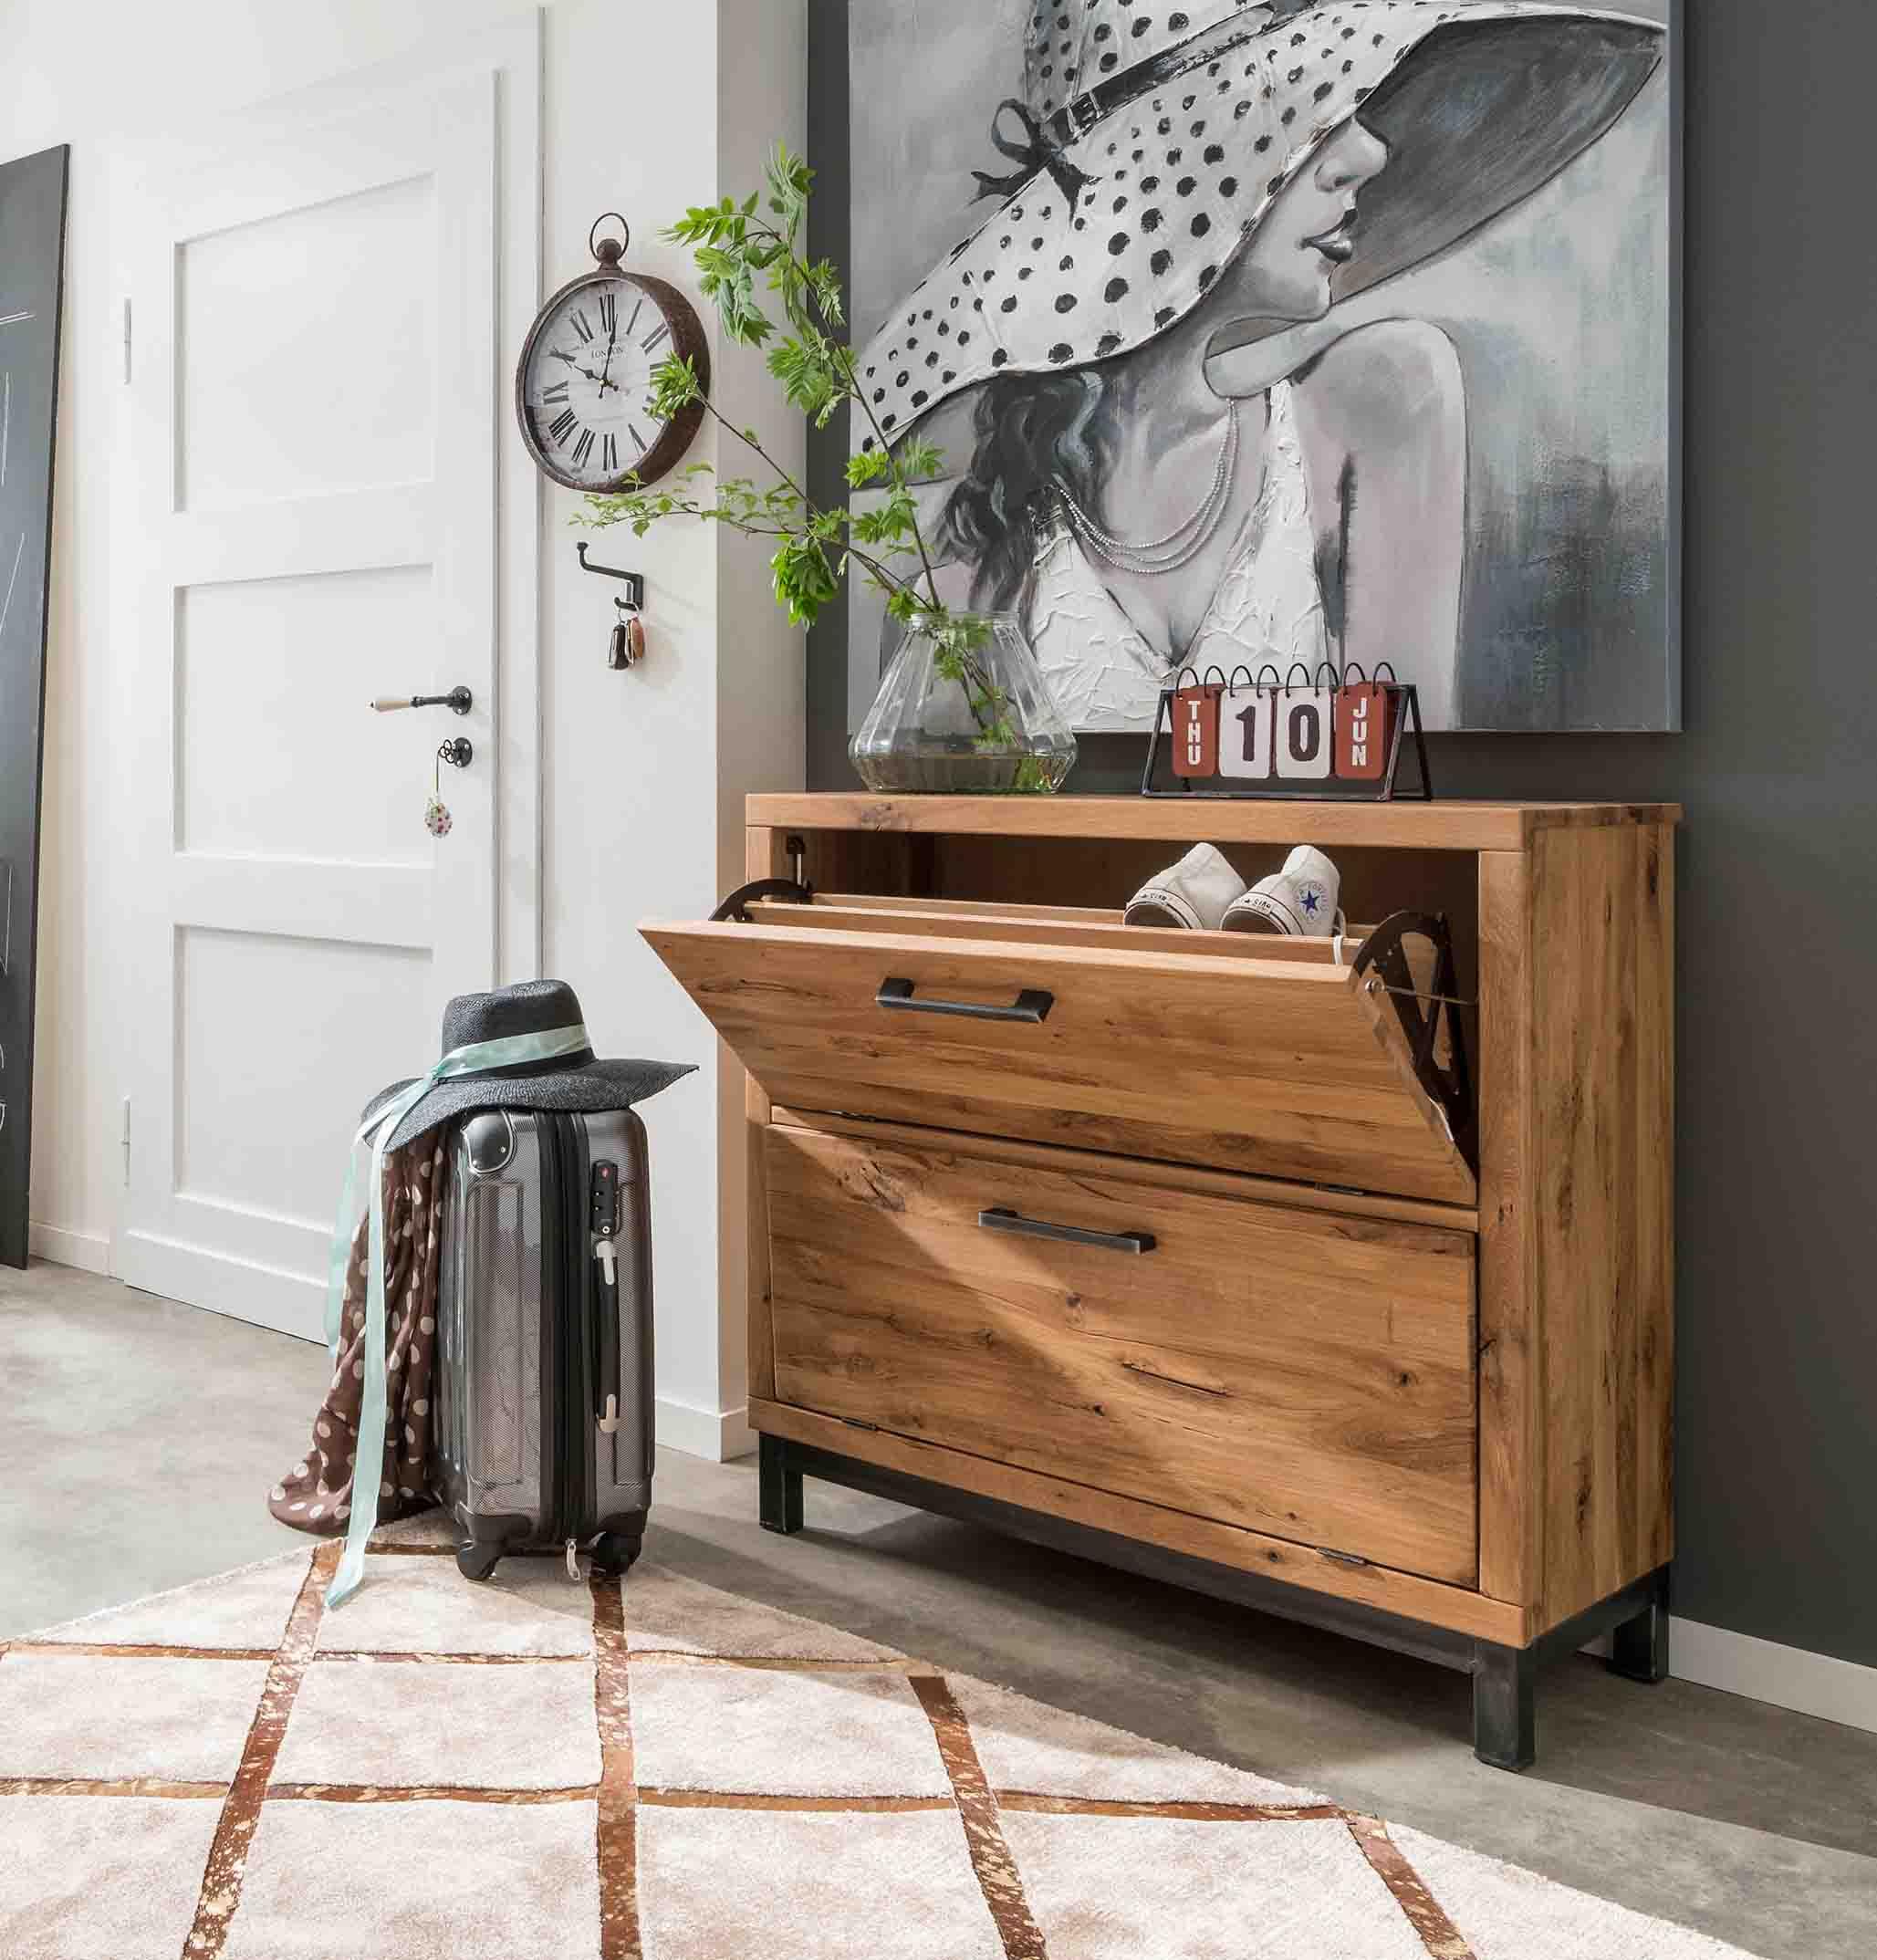 schuhschr nke angebote g nstig online kaufen massiva m. Black Bedroom Furniture Sets. Home Design Ideas